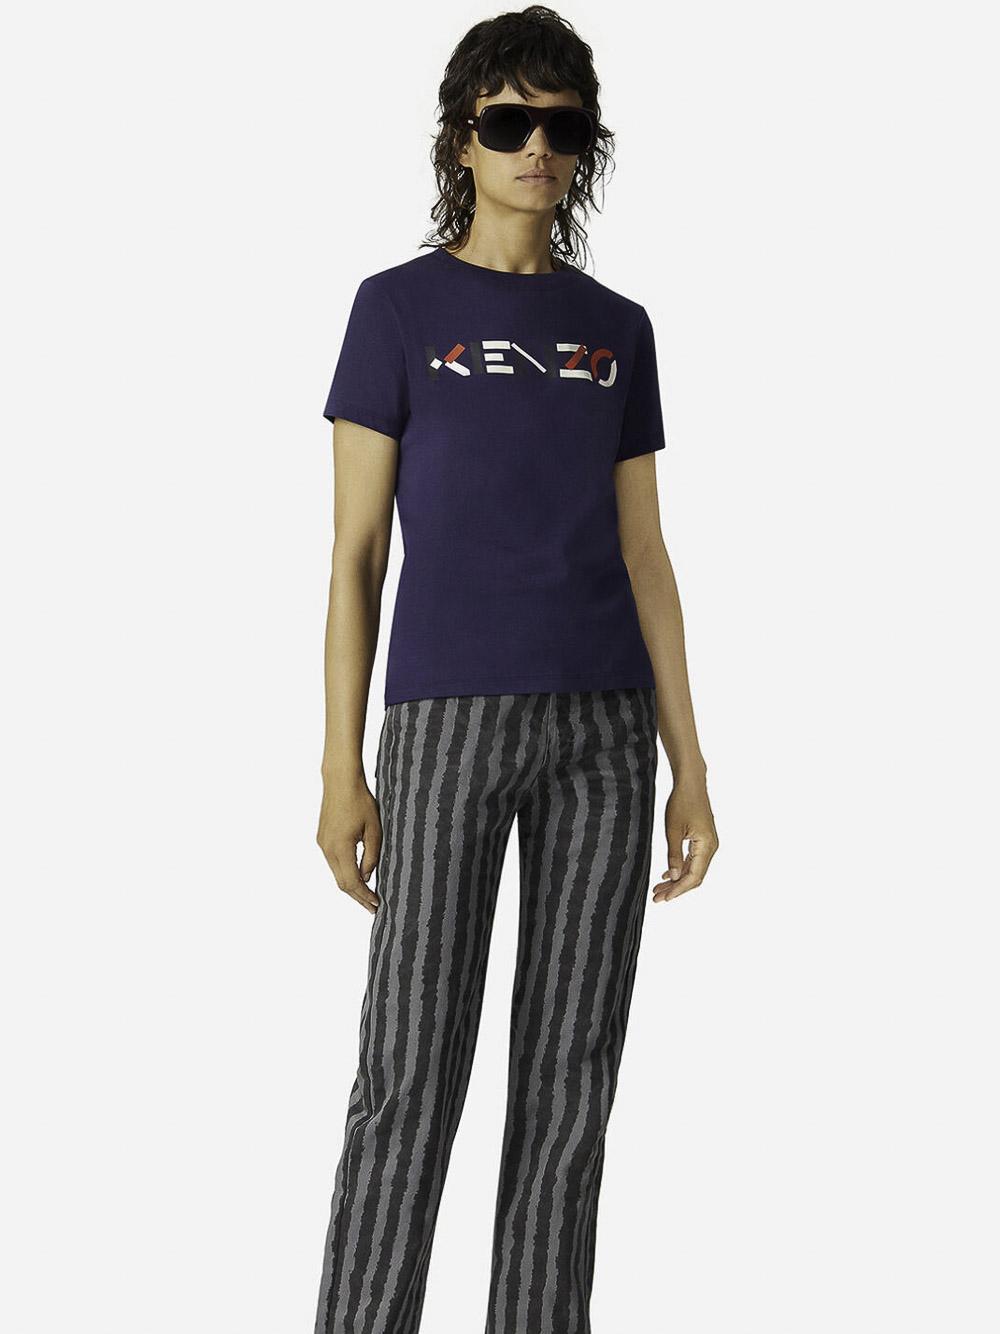 KENZO Μπλούζα t-shirt 2TS8404SA-76 ΜΠΛΕ